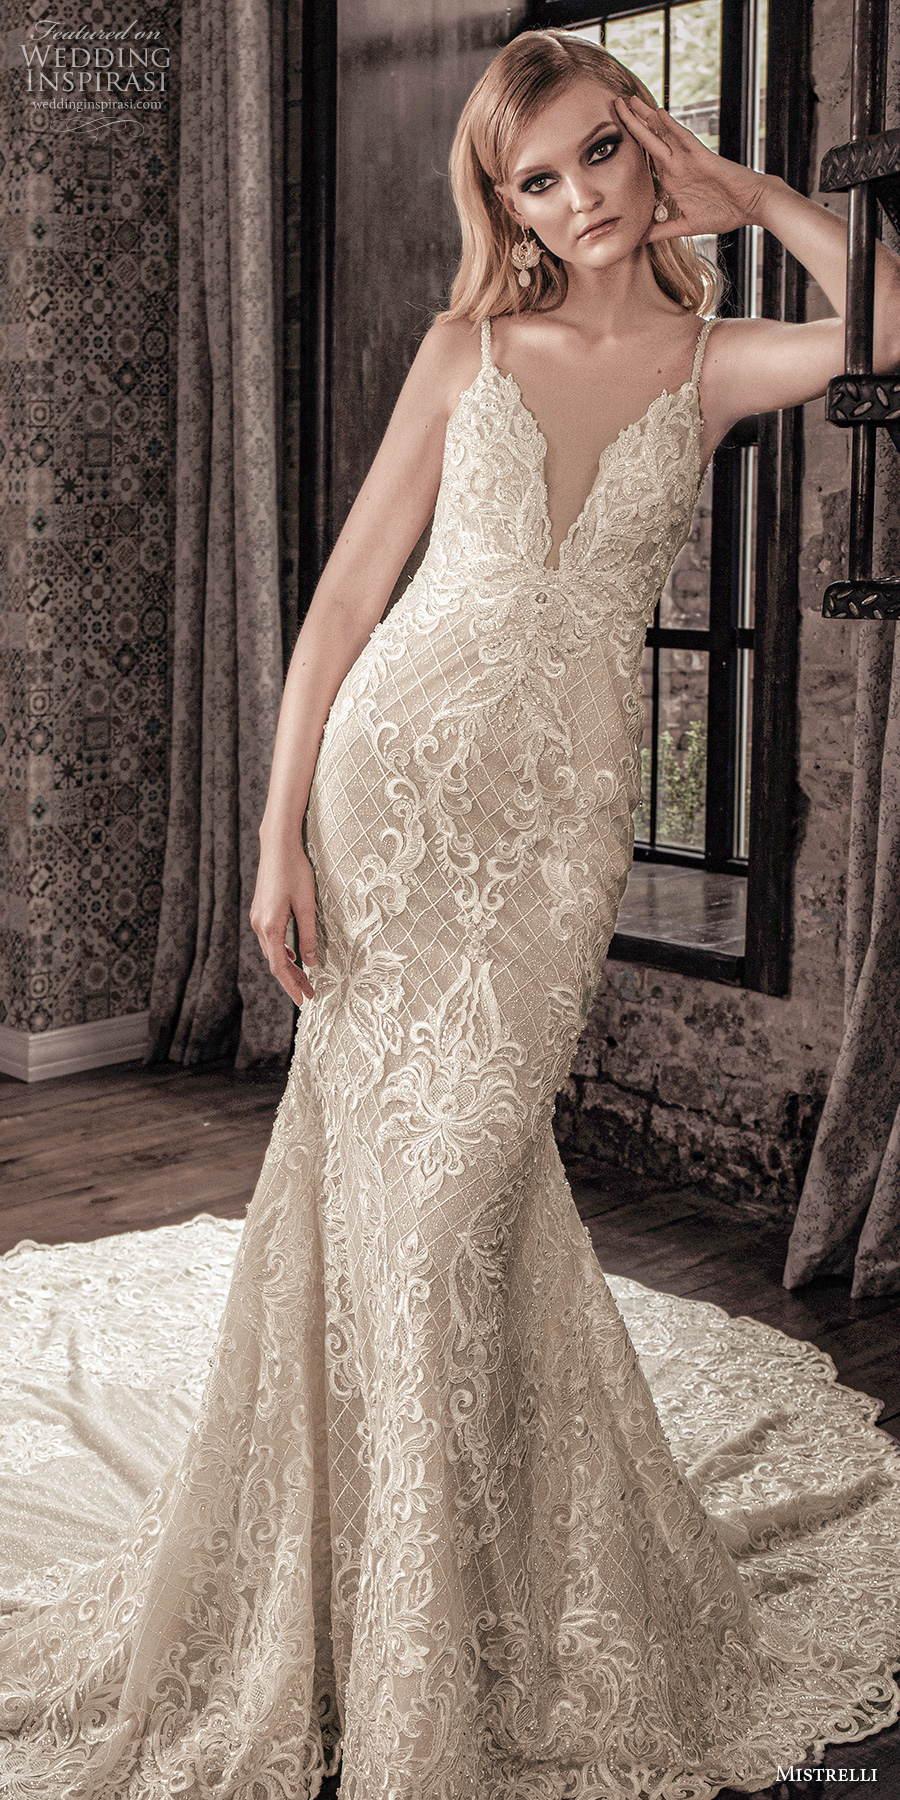 mistrelli 2021 royal drama bridal sleeveless thin strap diamond neckline full embellishment elegant fit and flare sheath wedding dress embellished cowl back chapel train (11) lv